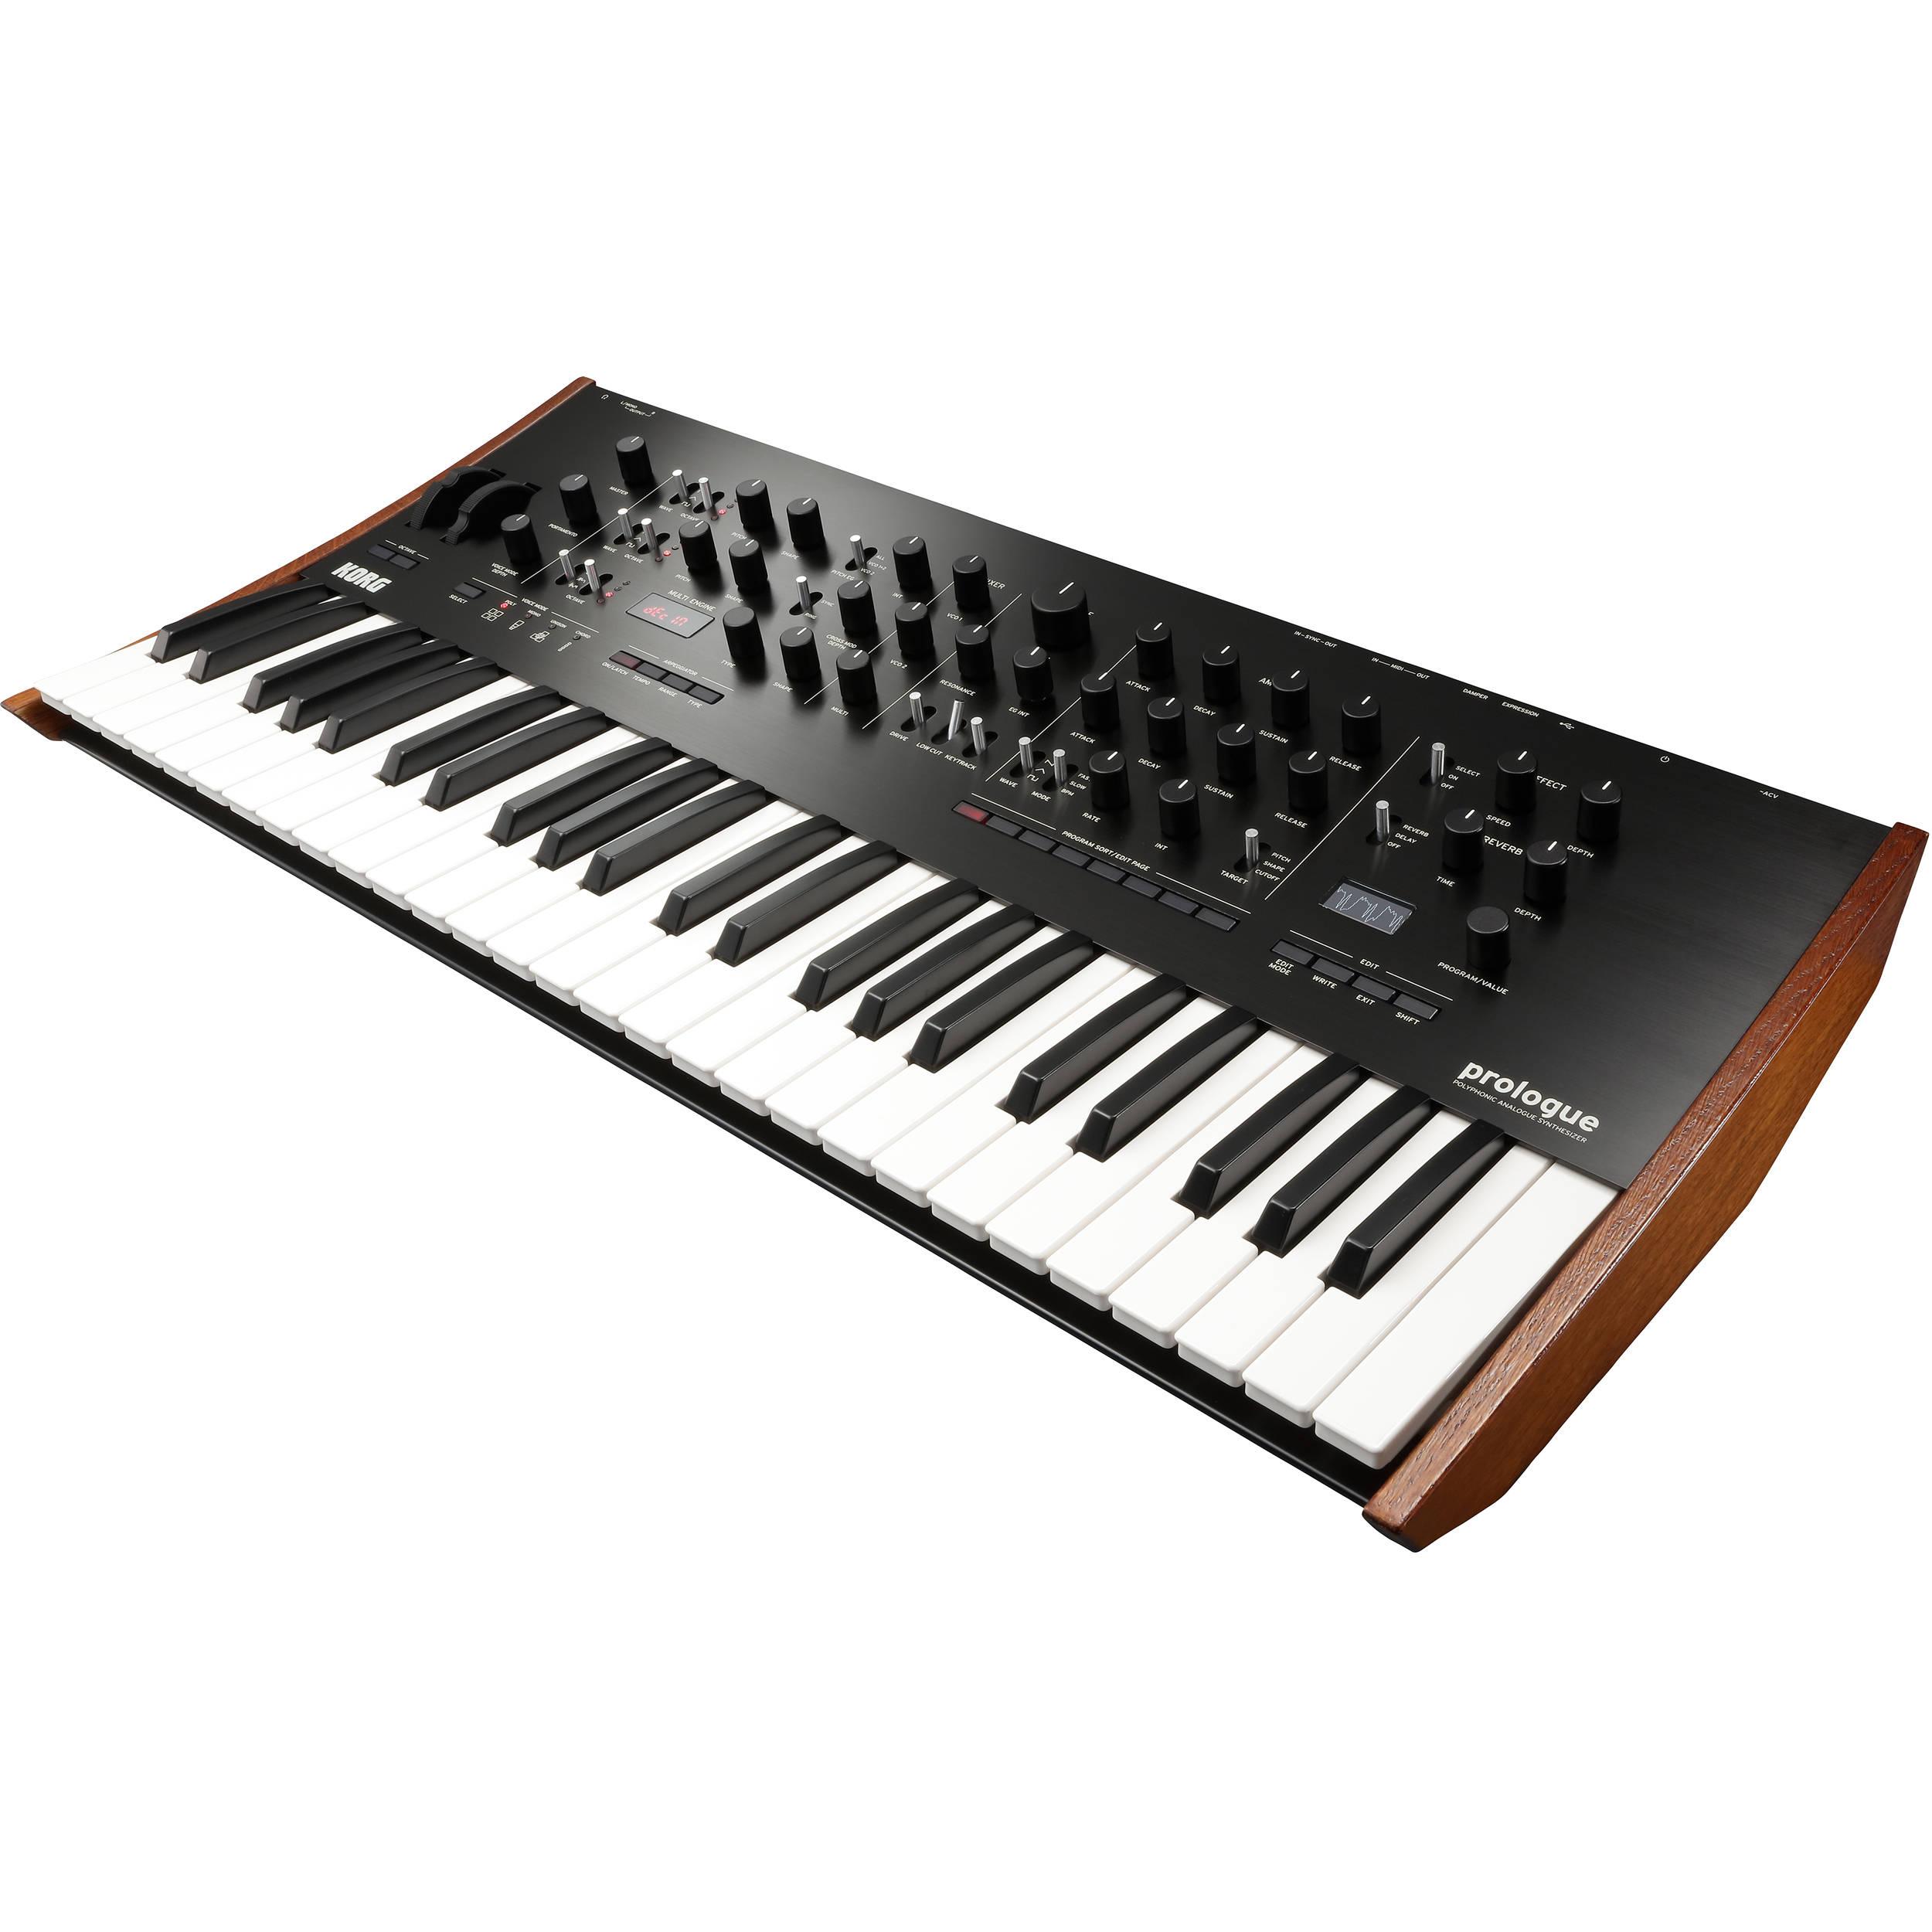 42a14768619 Korg Prologue - Polyphonic Analog Synthesizer (8-Voice)